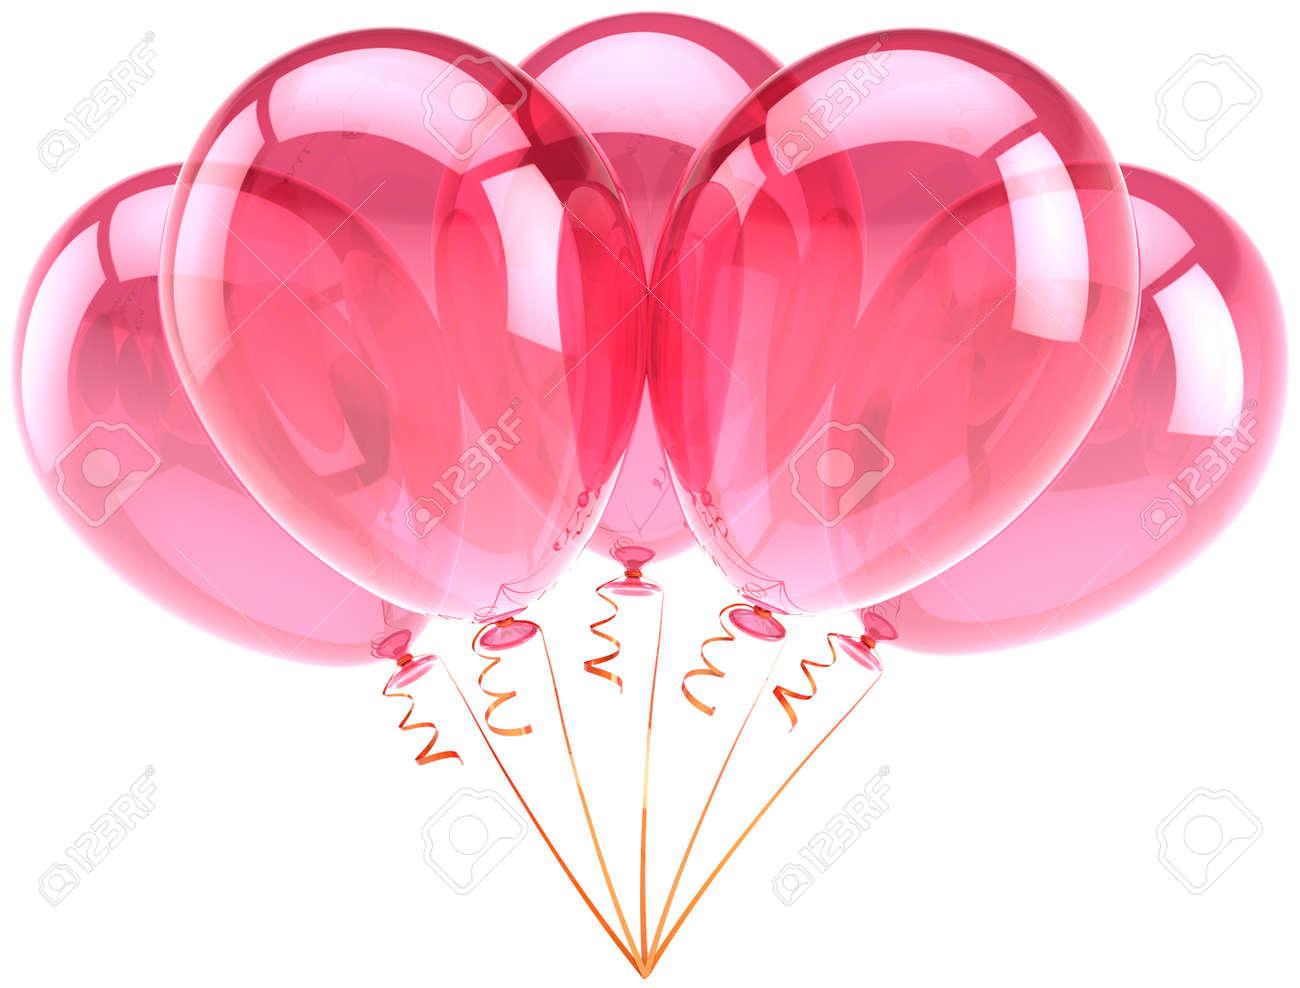 Ballons Rosa Geburtstag Party Celebration Geburtstag Dekoration